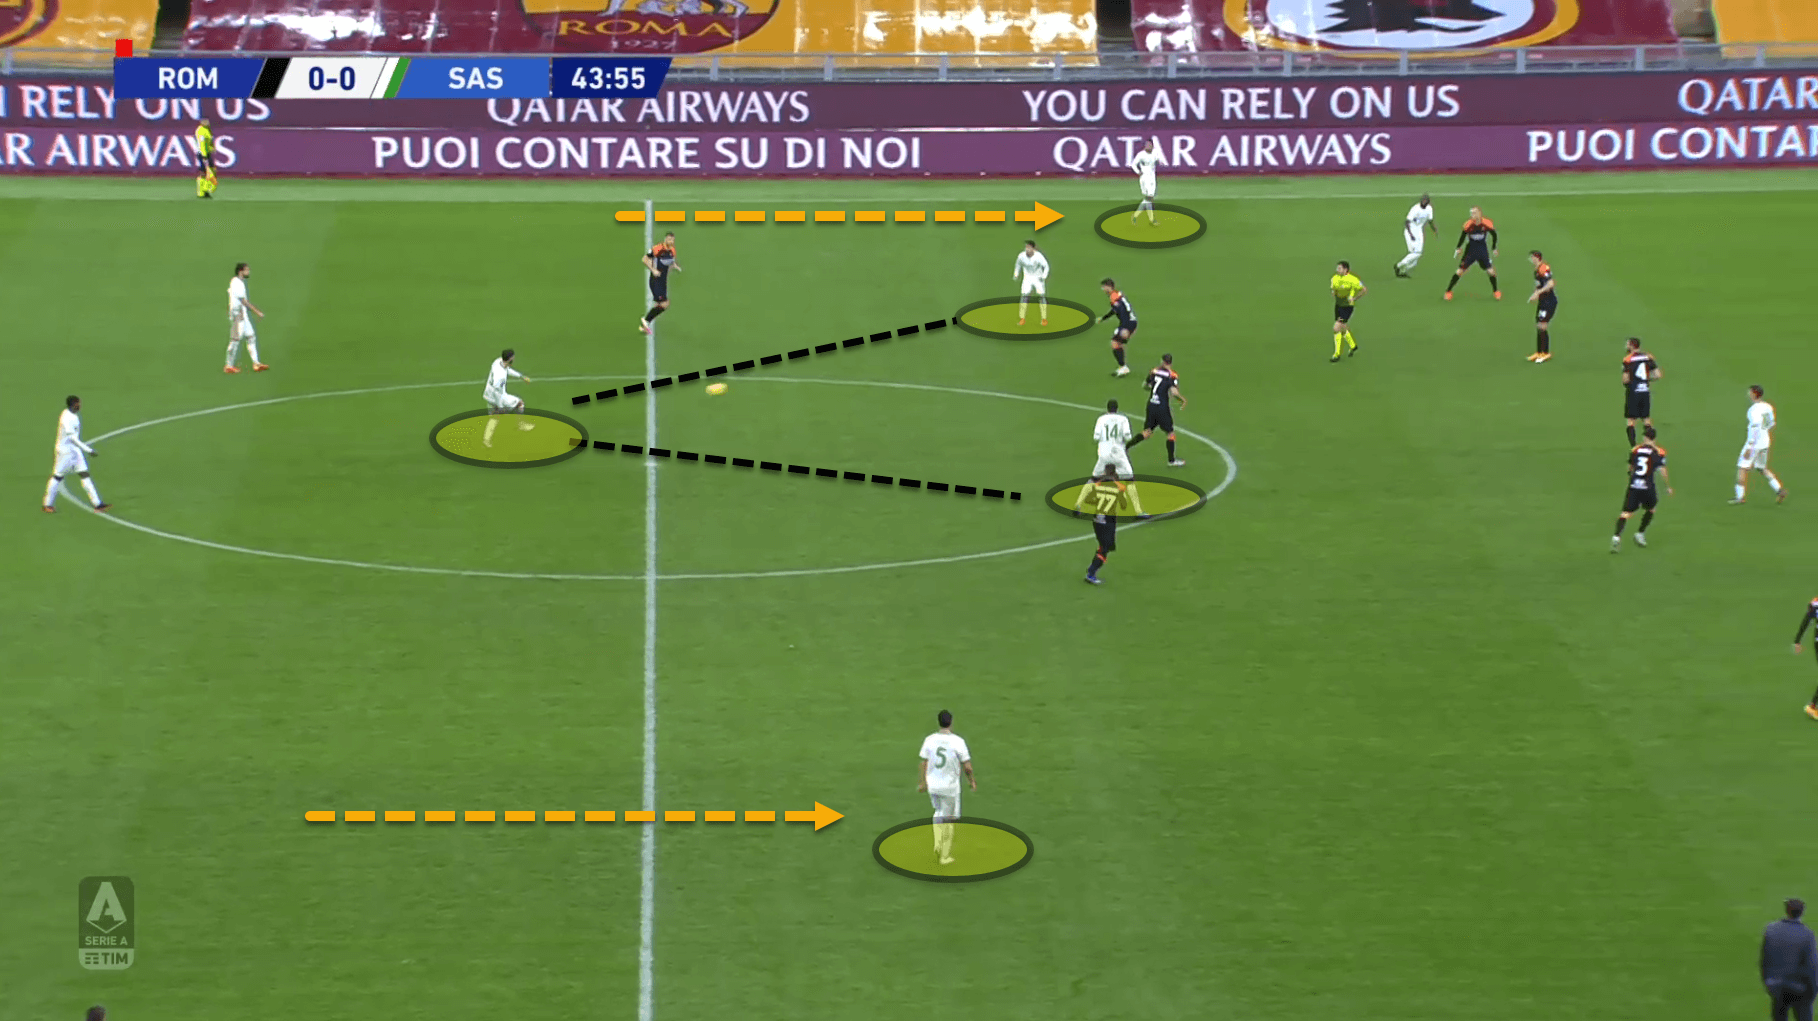 Serie A 2020/21: Roma vs Sassuolo – tactical analysis tactics